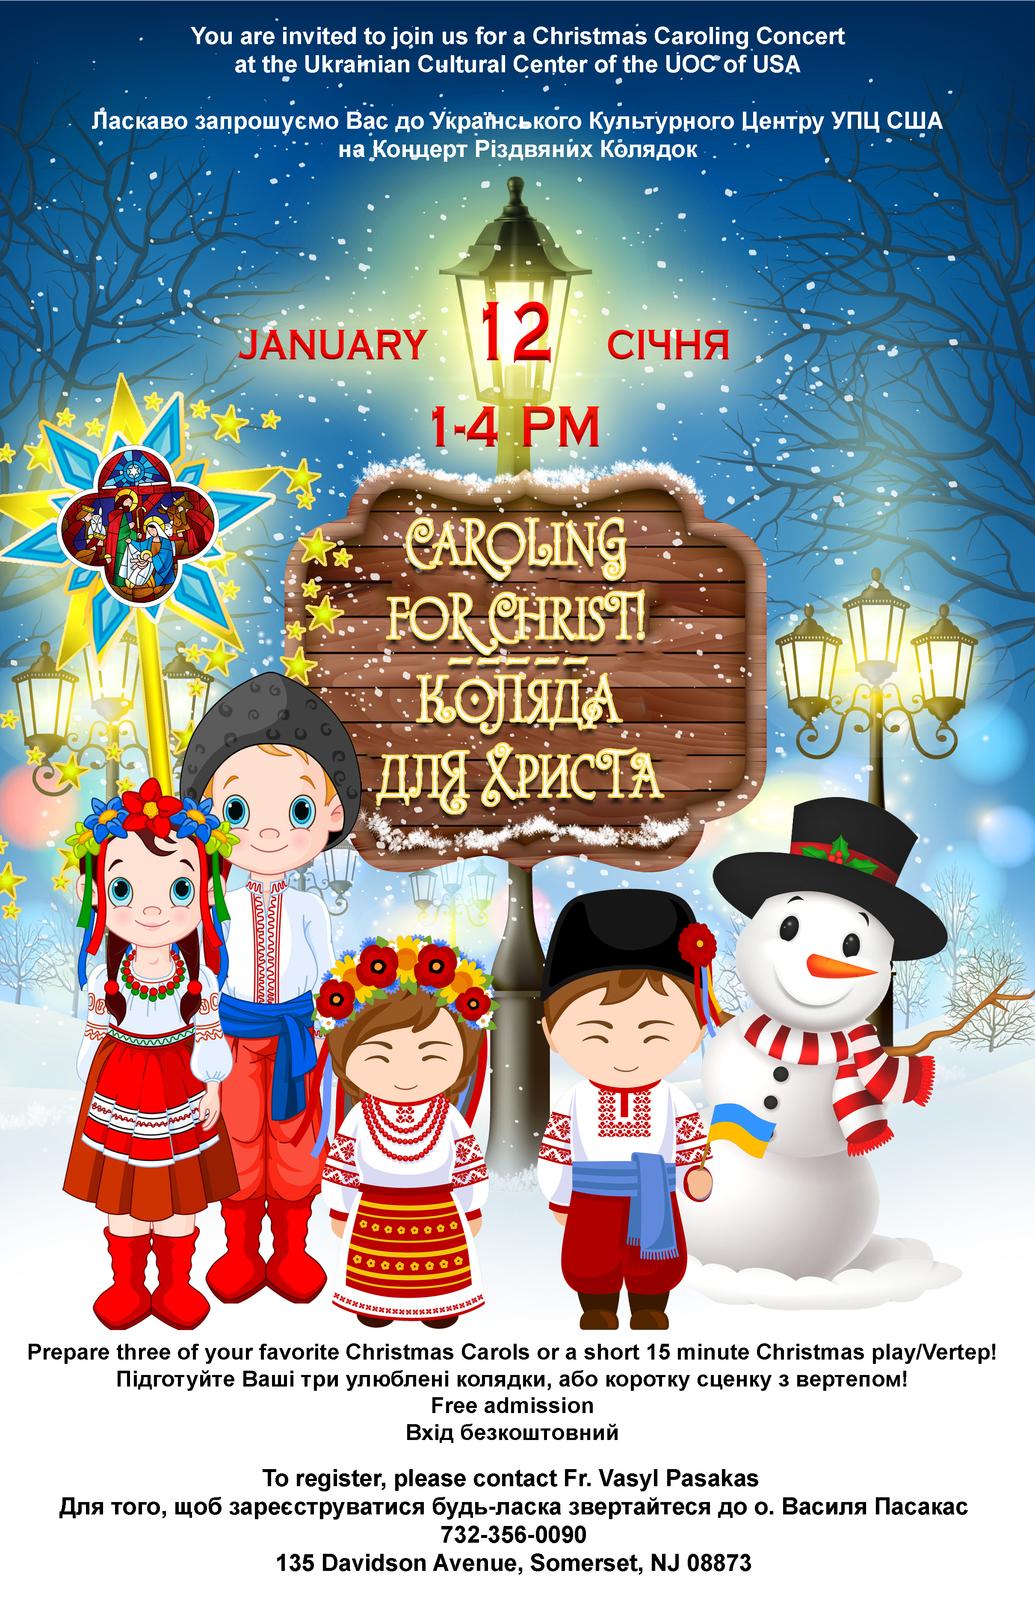 When Is Ukrainian Christmas 2019 Ukrainian Orthodox Church of the USA   12 January, 2019   Annual